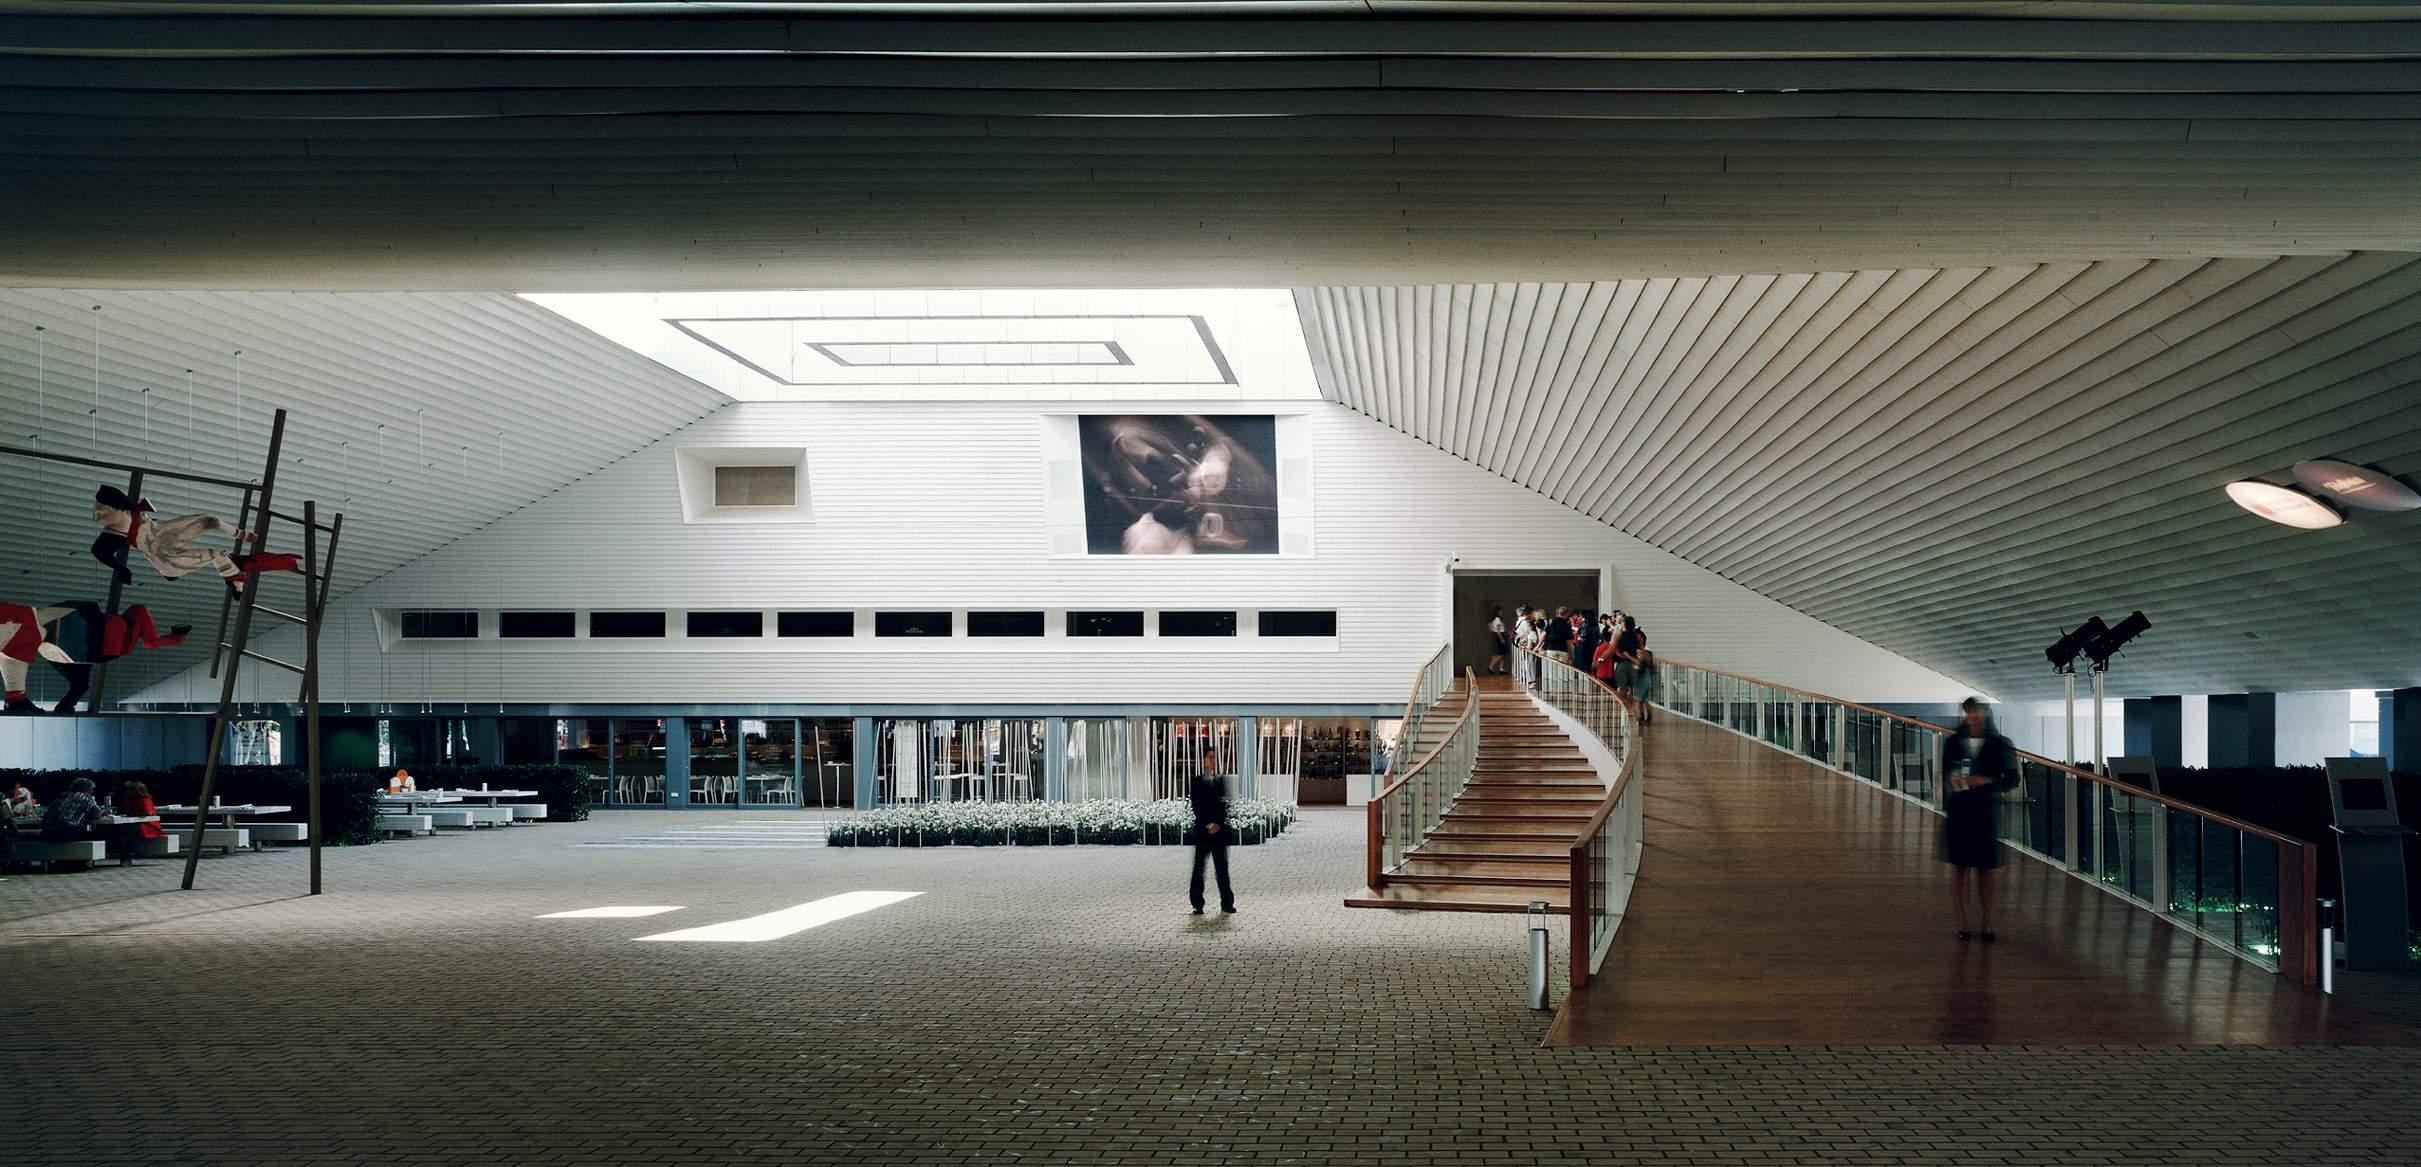 7-hannover-plaza-interiordm12